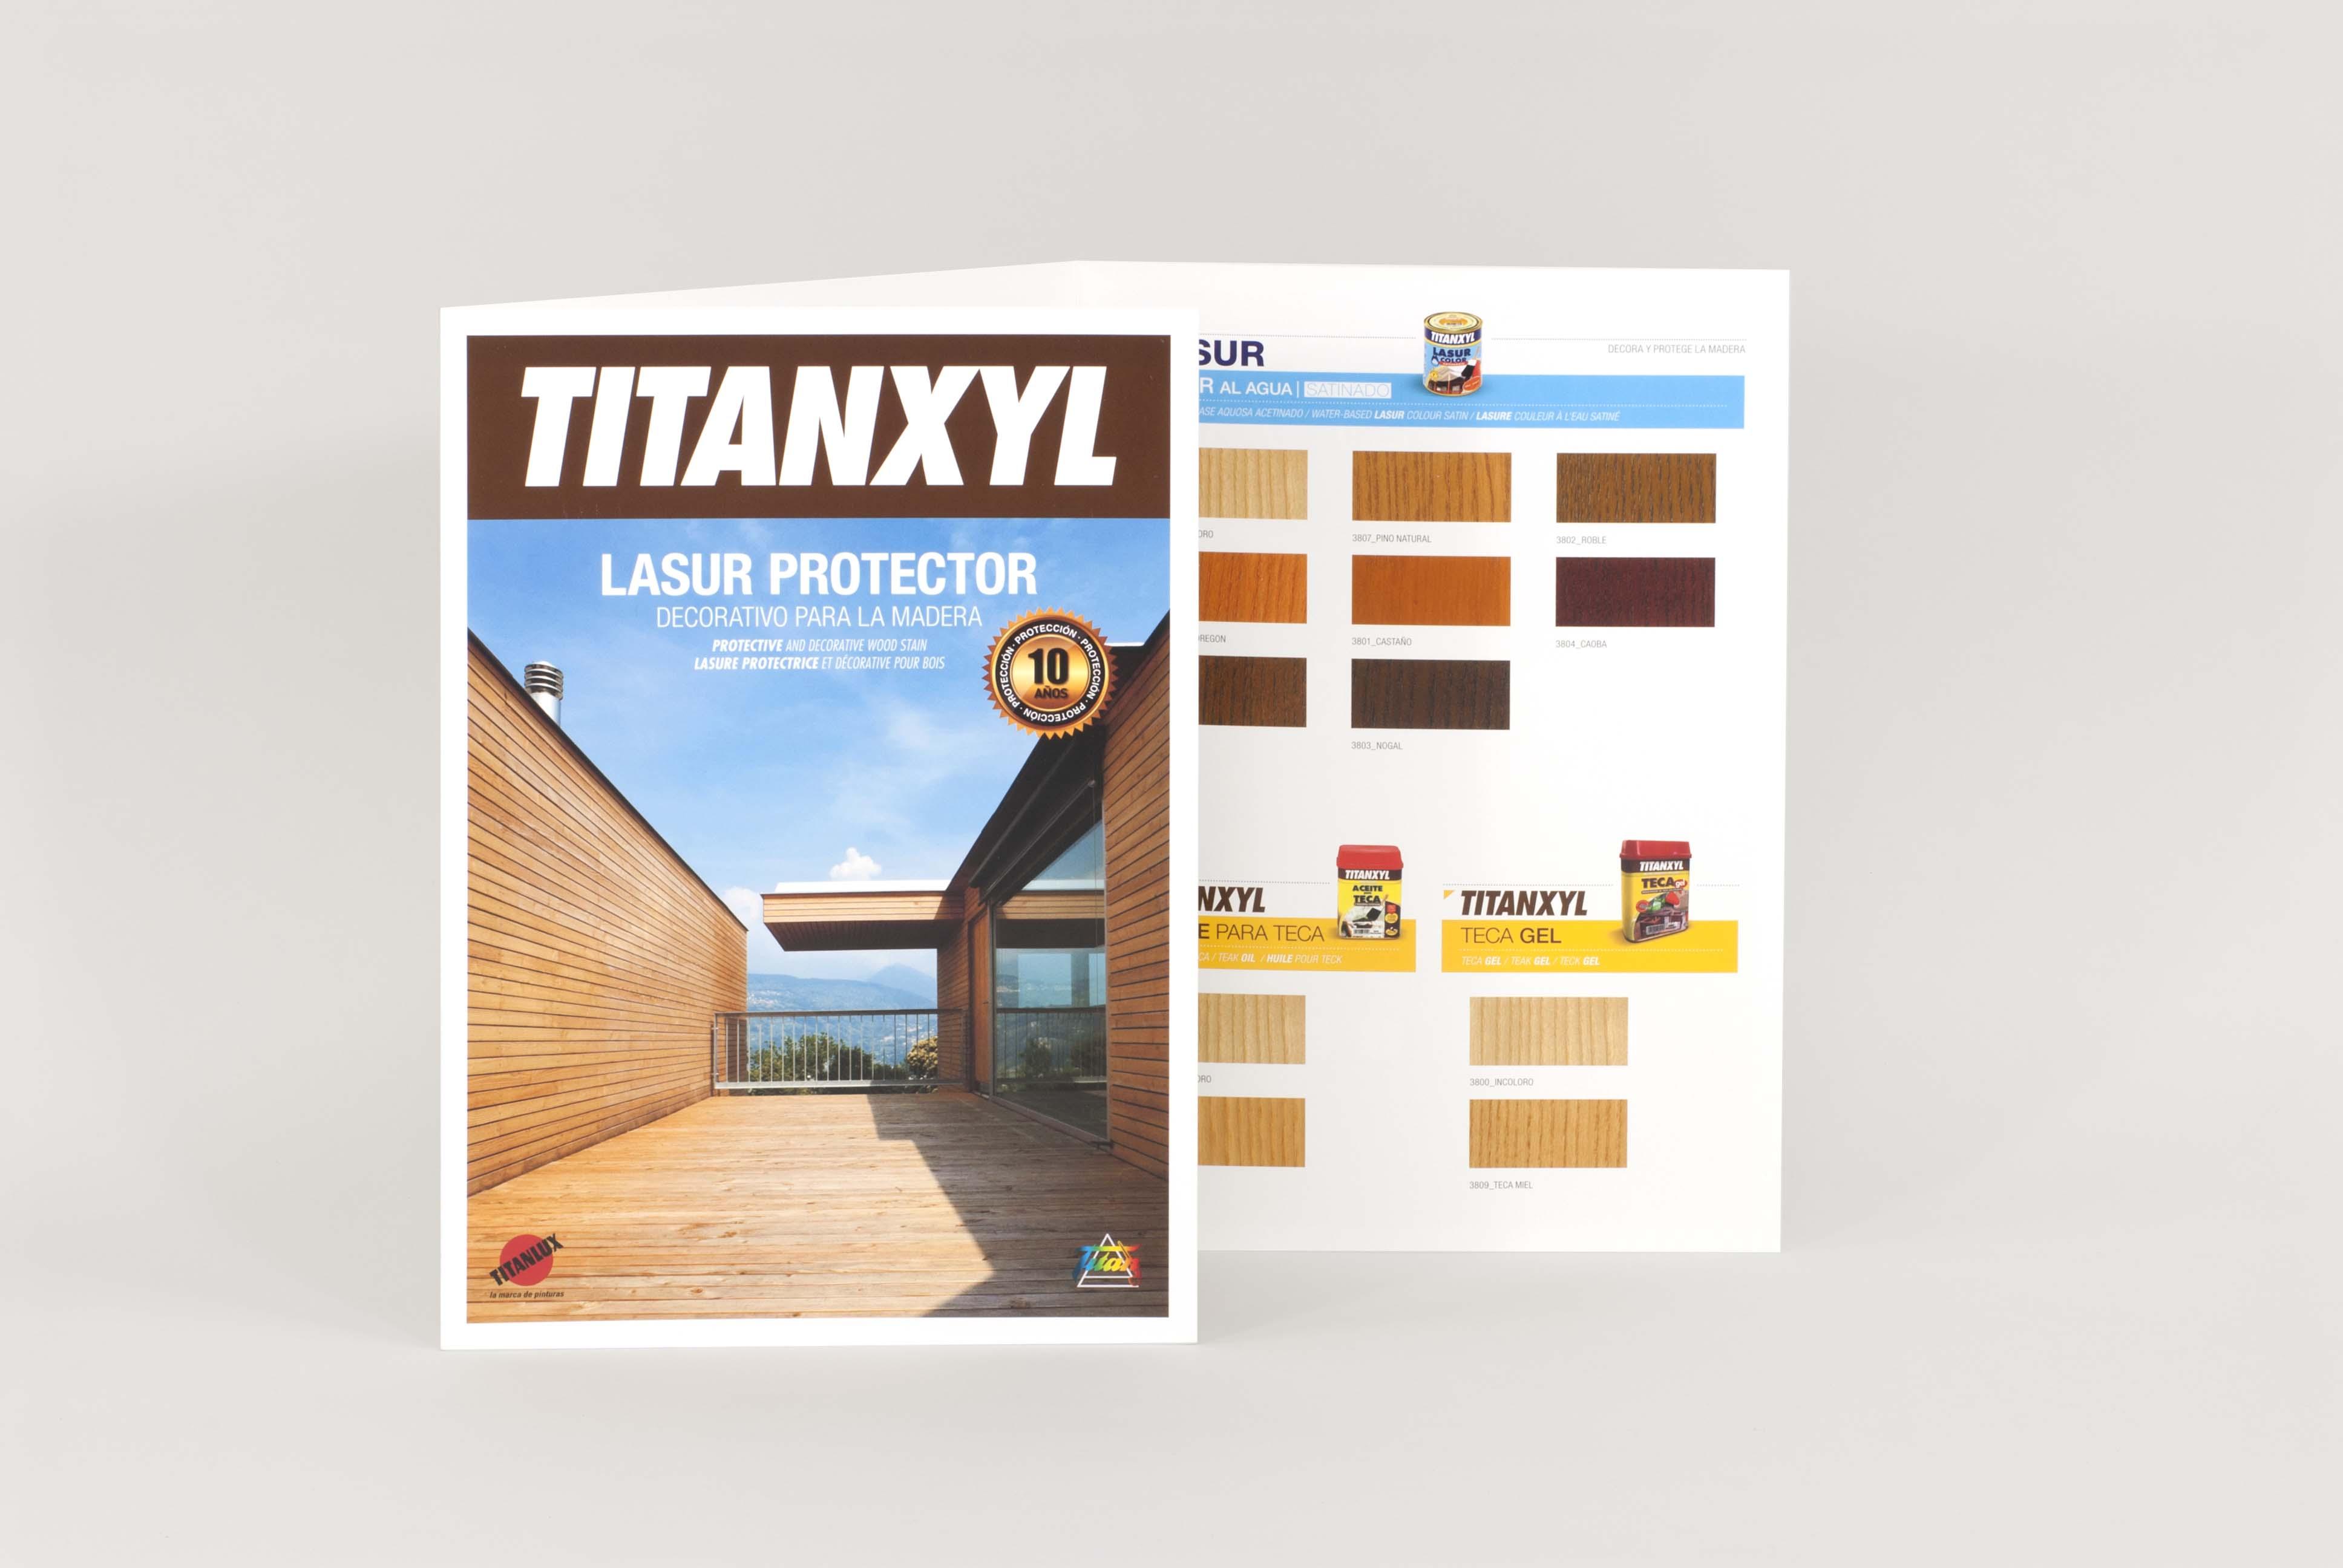 0348_Titanxyl